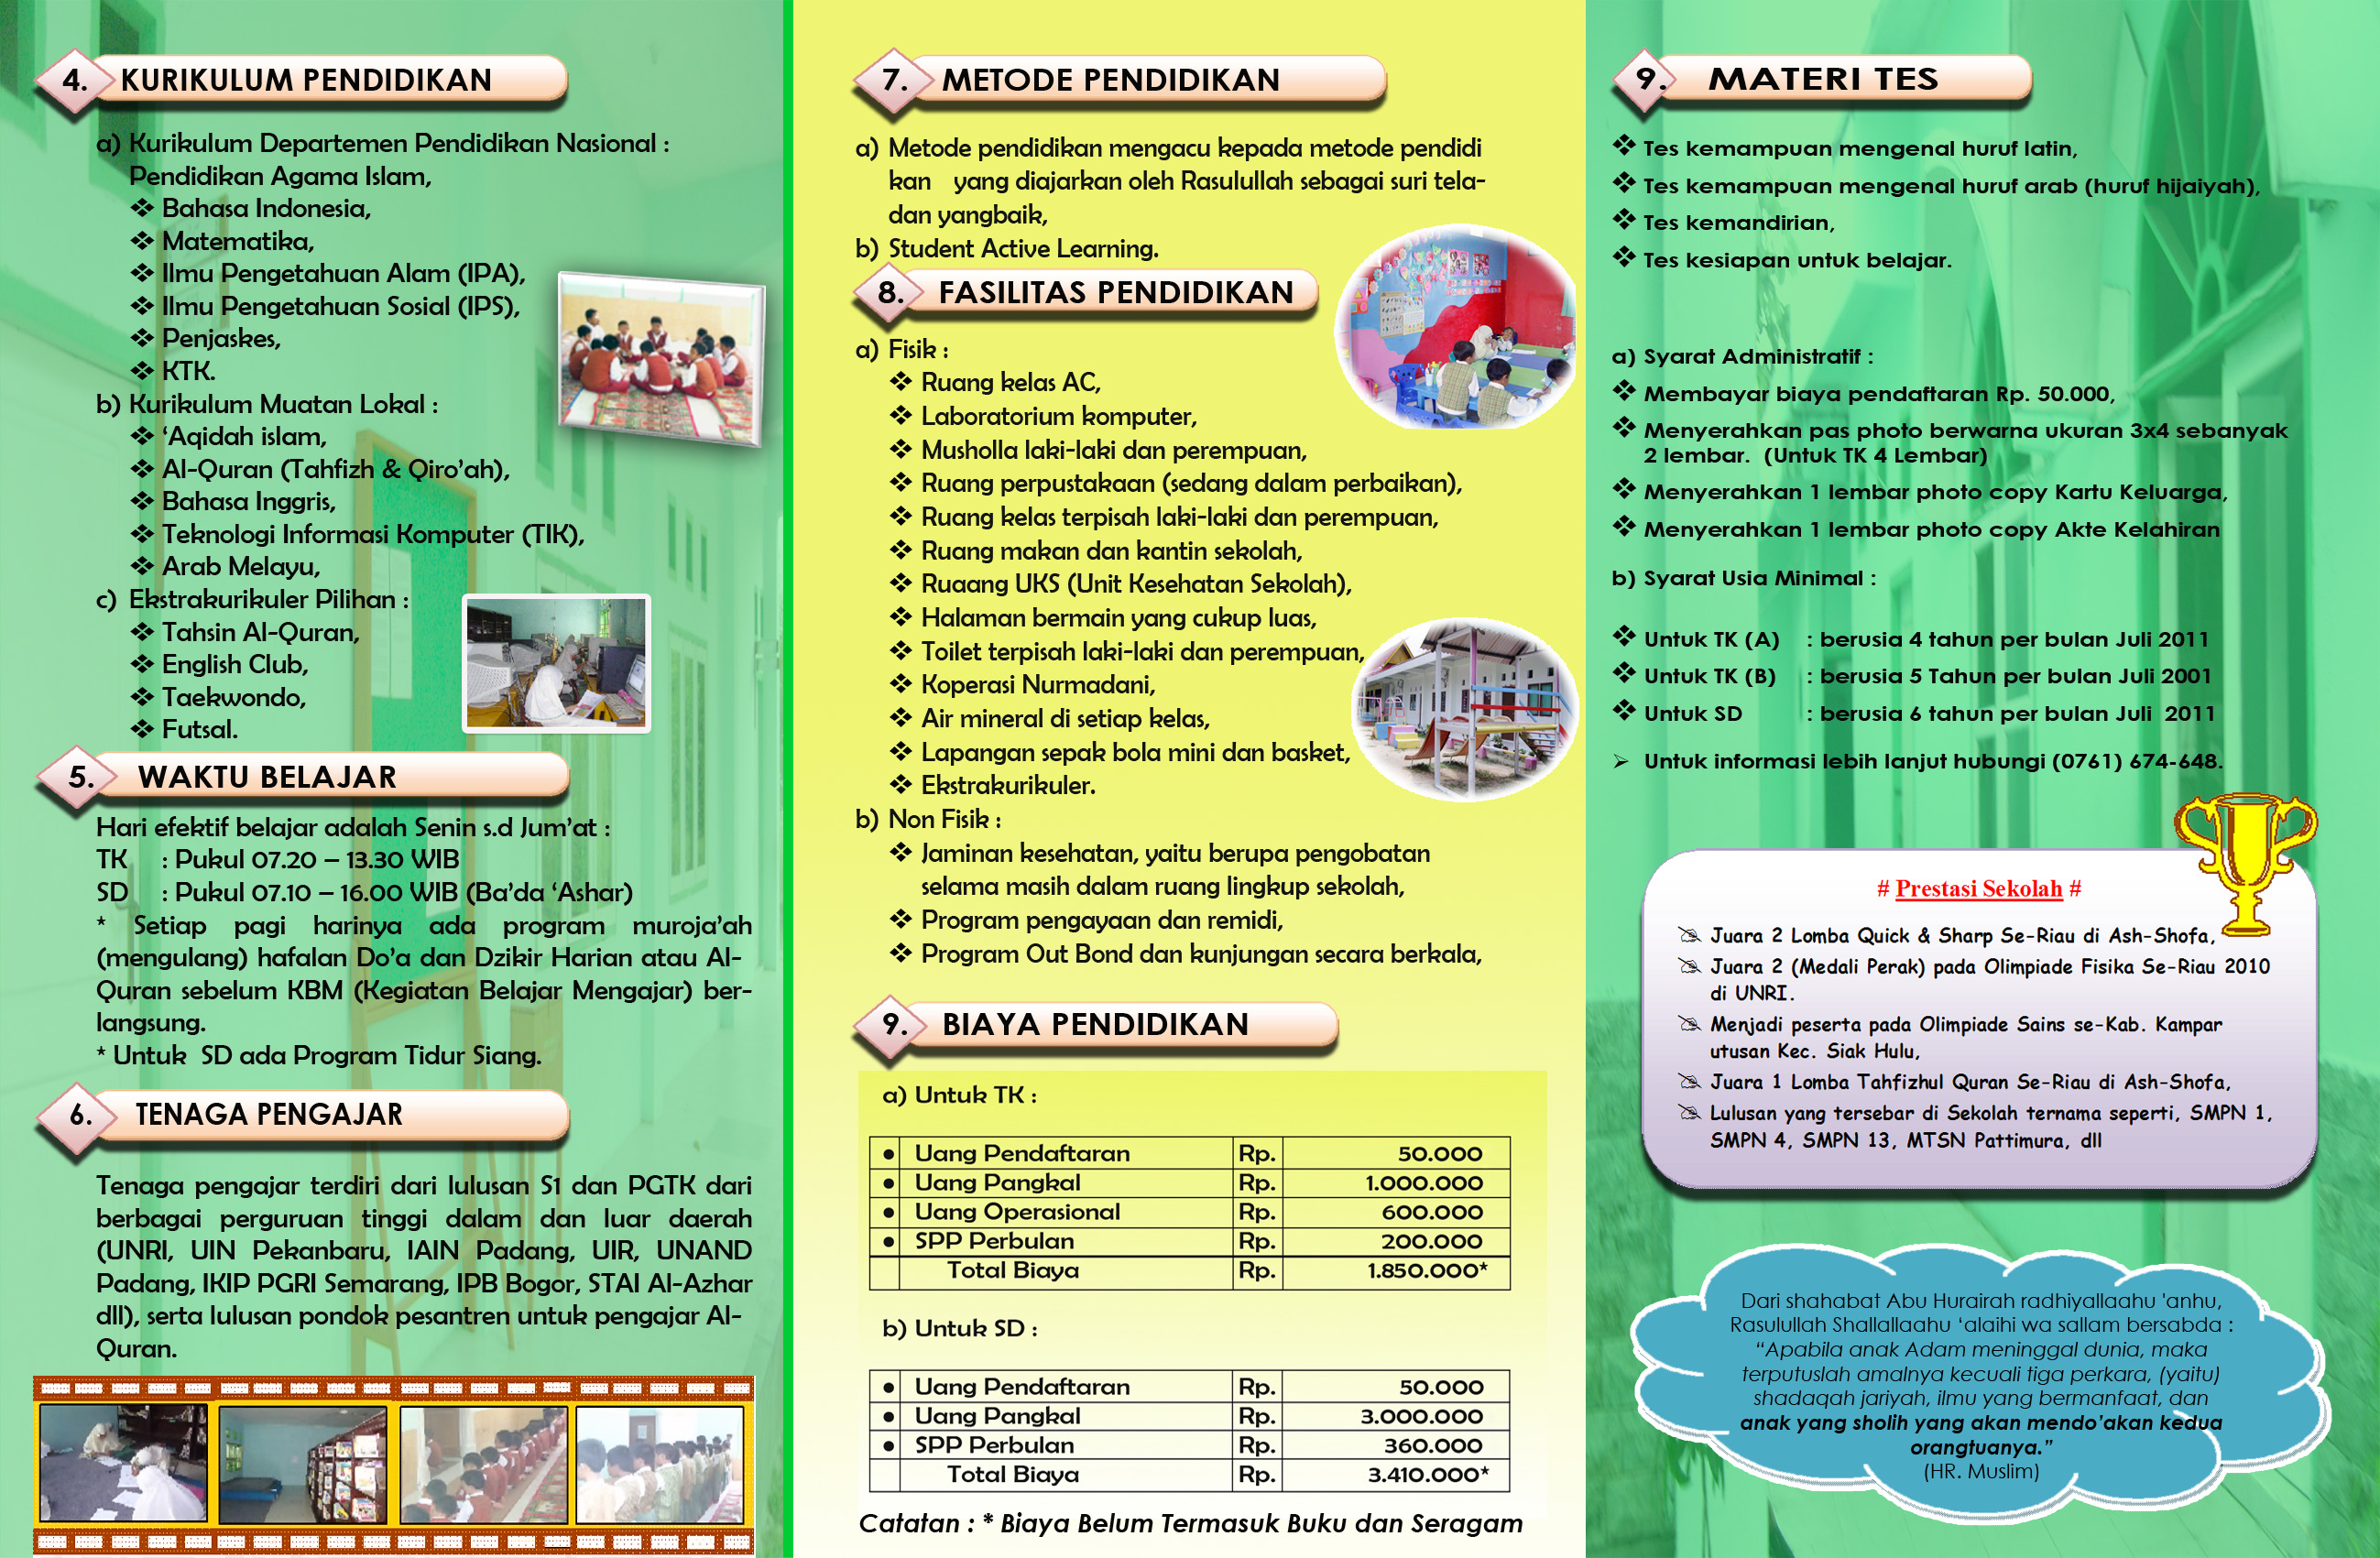 TK-SD Islam Nurmadani Membuka Pendaftaran Siswa Baru